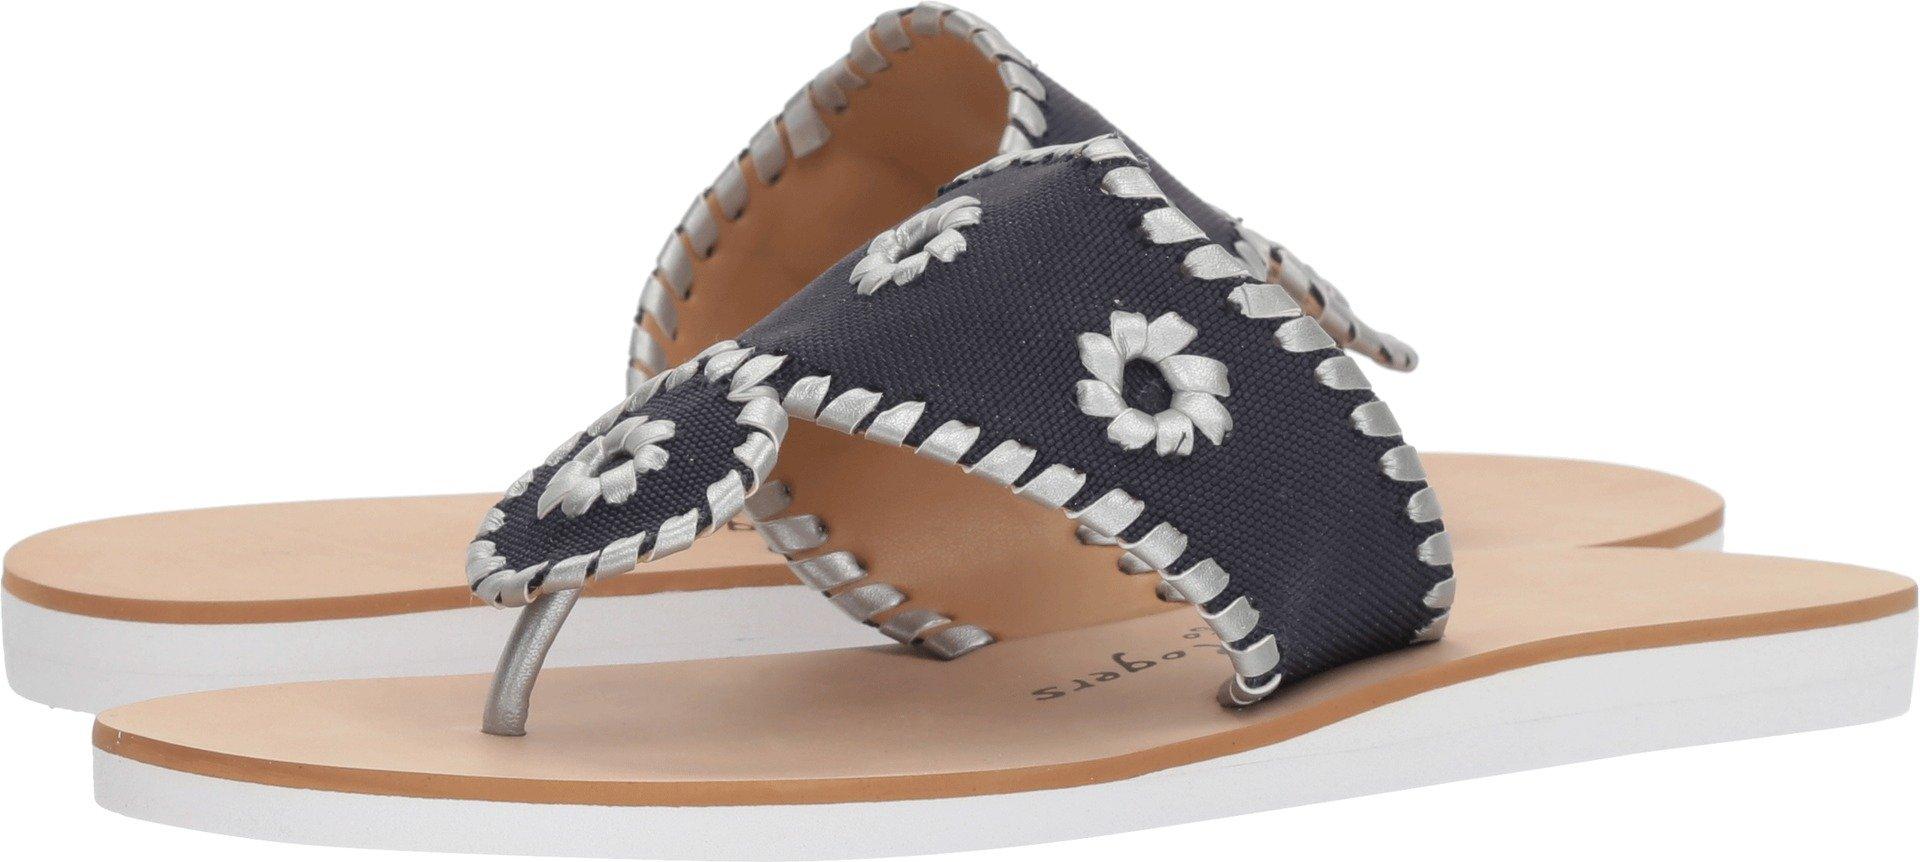 Jack Rogers Women's Captiva Flat Sandal, Midnight/Silver, 7 M US